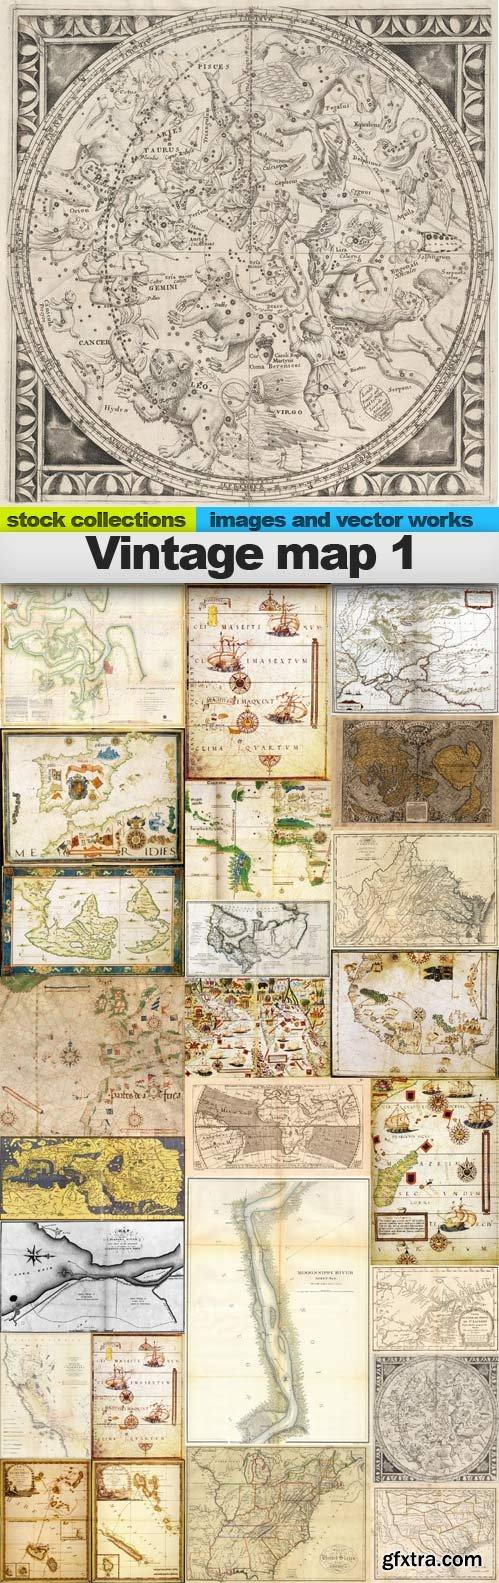 Vintage map 1,25 x UHQ JPEG